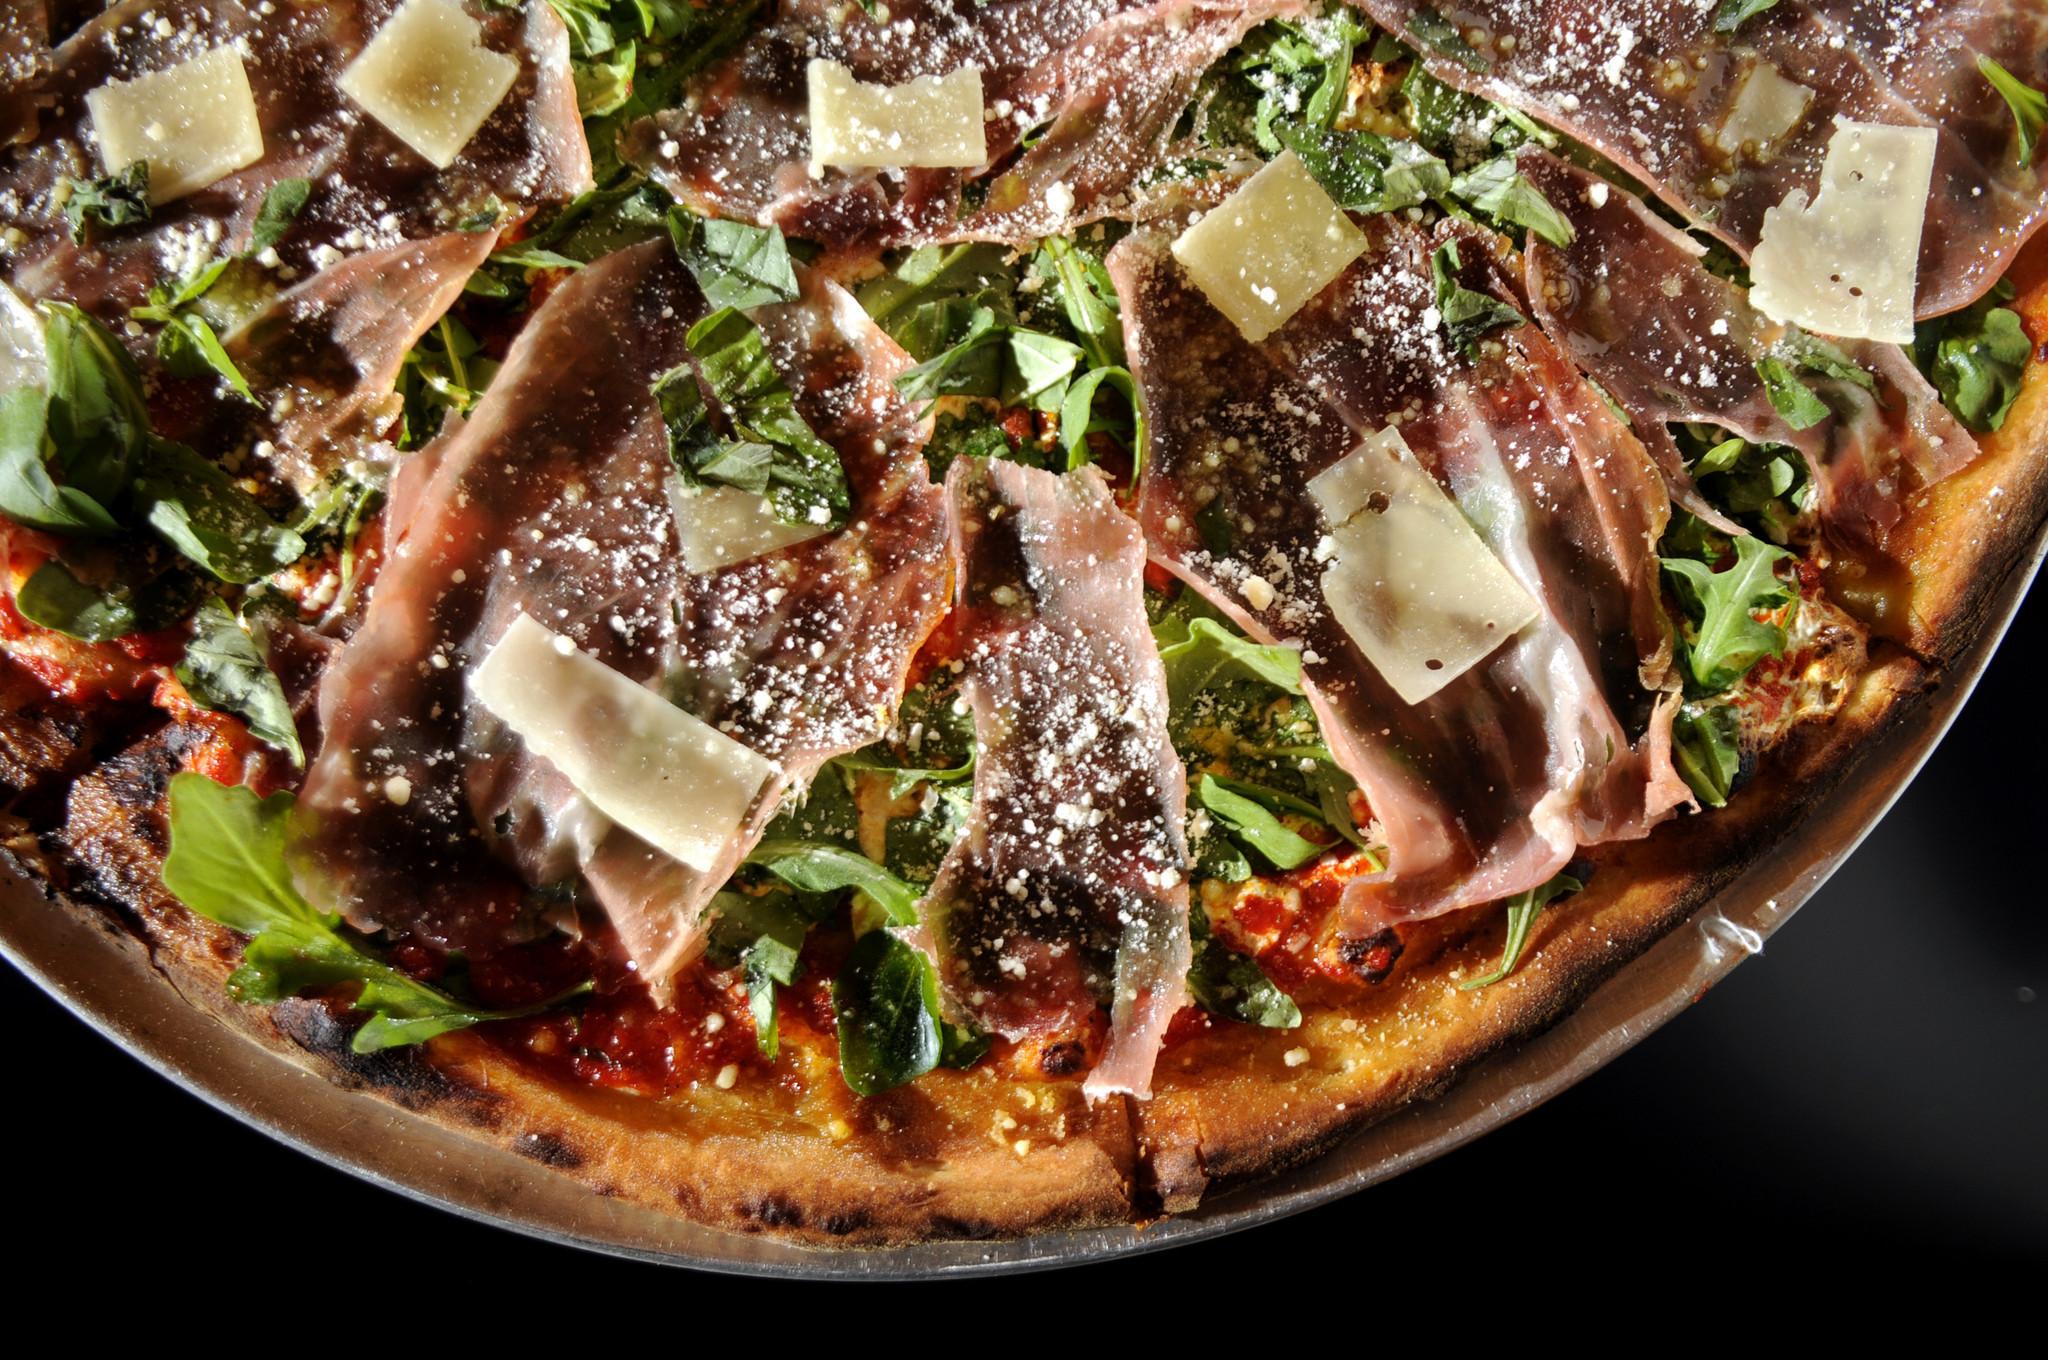 Best Italian Restaurants In Cheshire Ct